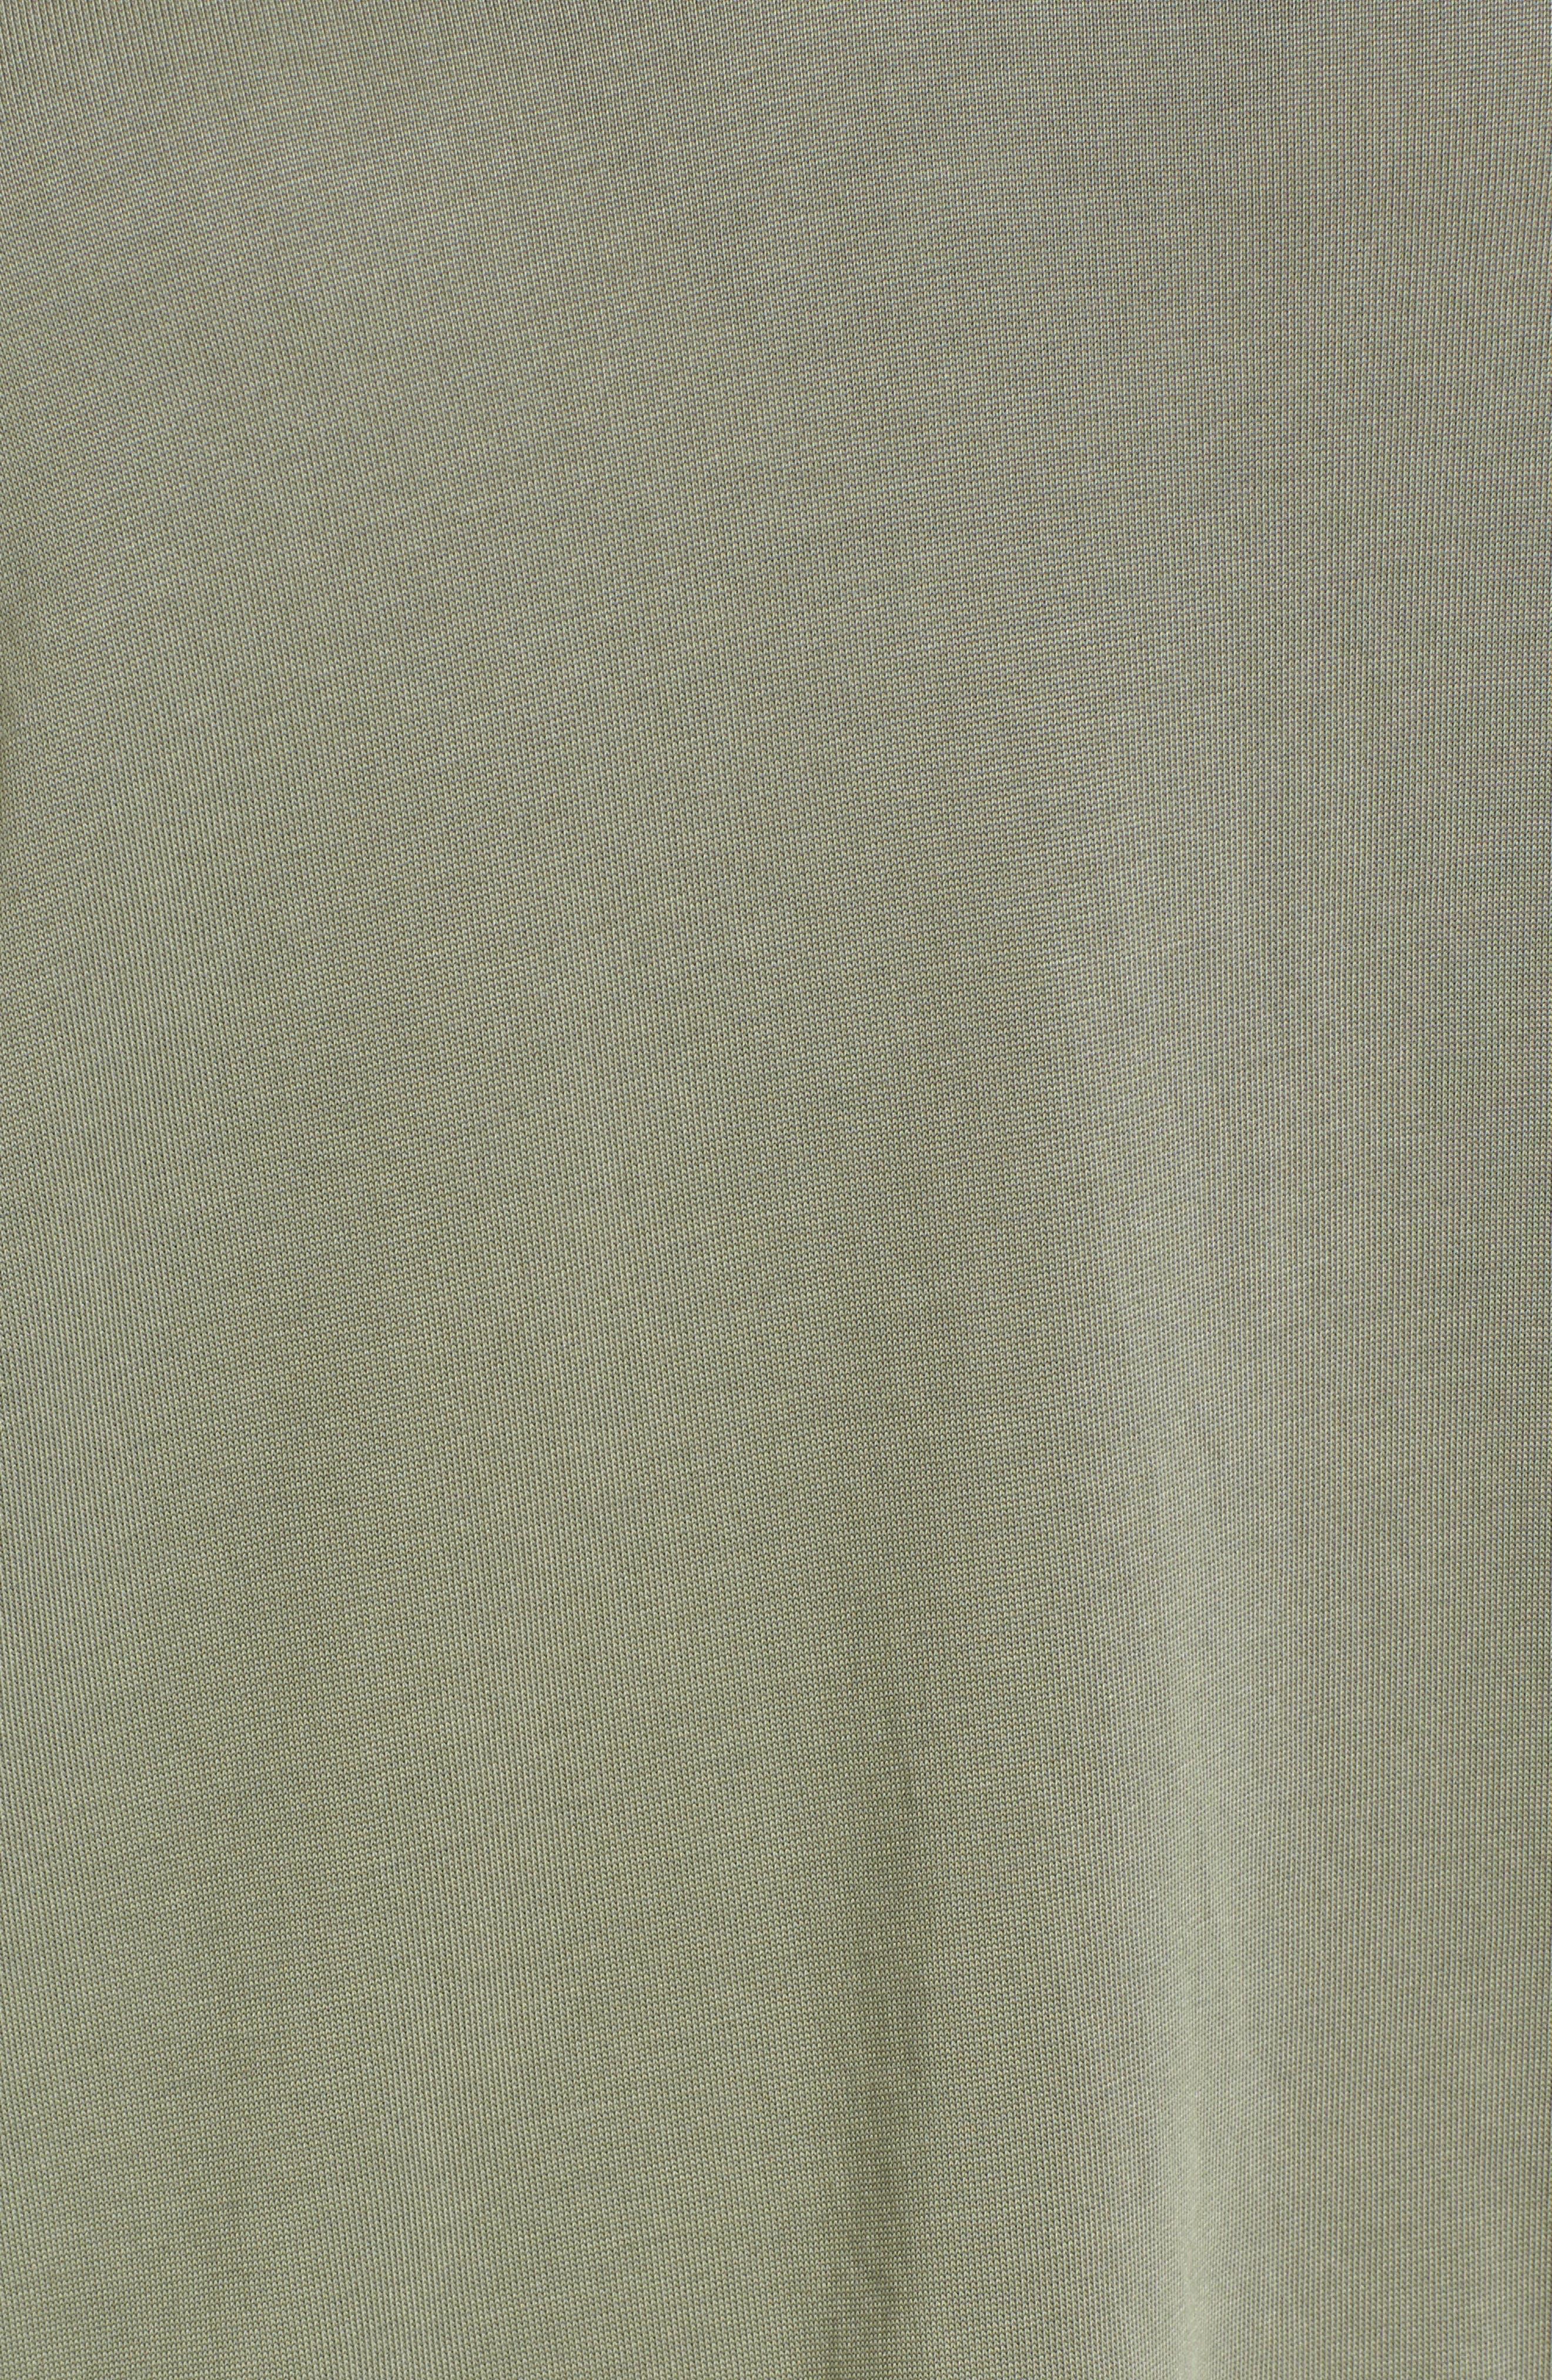 Alternate Image 5  - BP. Double V Swing Camisole